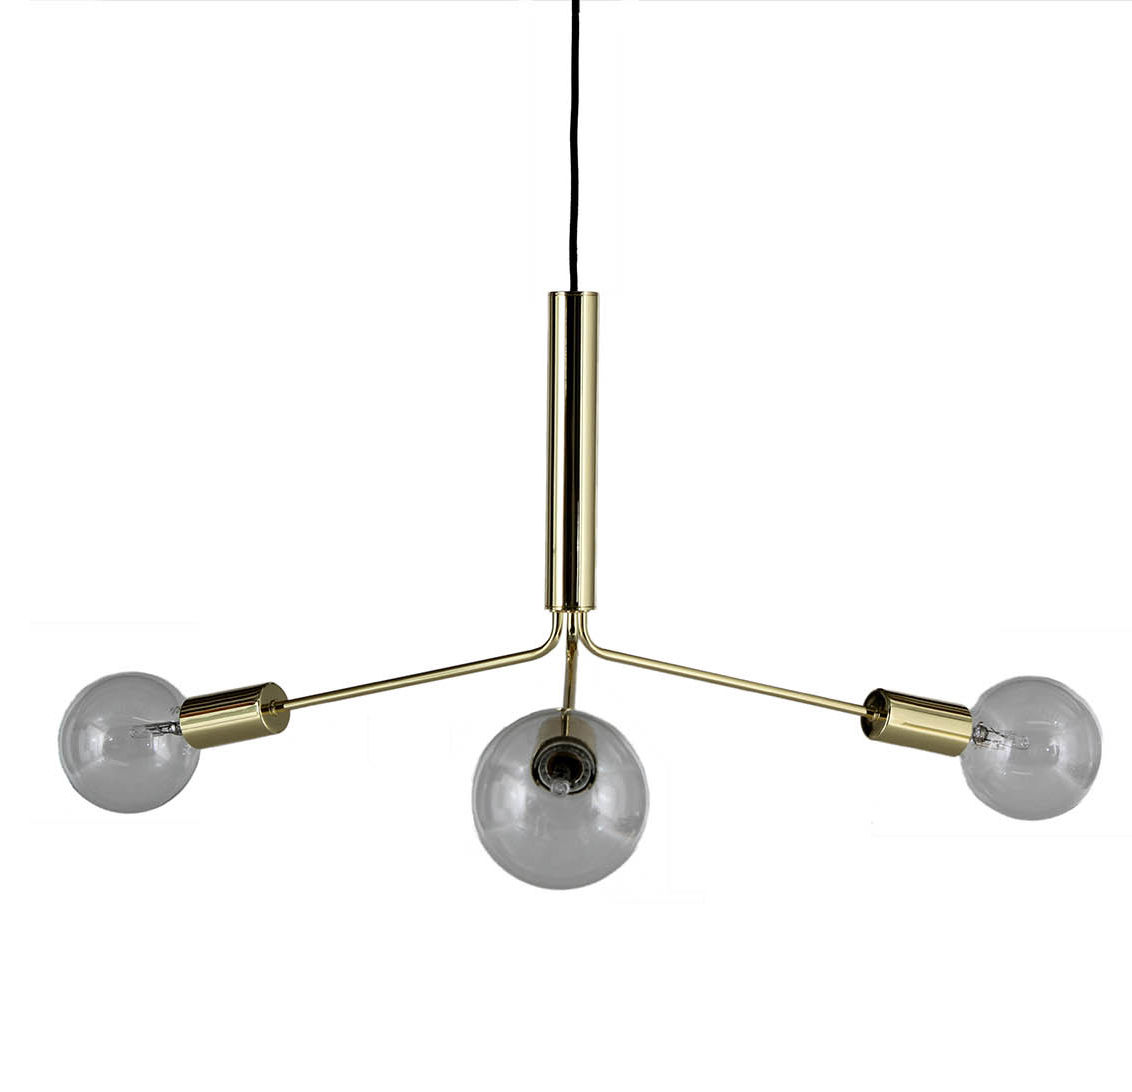 Lighting - Pendant Lighting - Grand Metro Pendant - Arm L 27 cm by Frandsen - Brushed brass - Painted metal